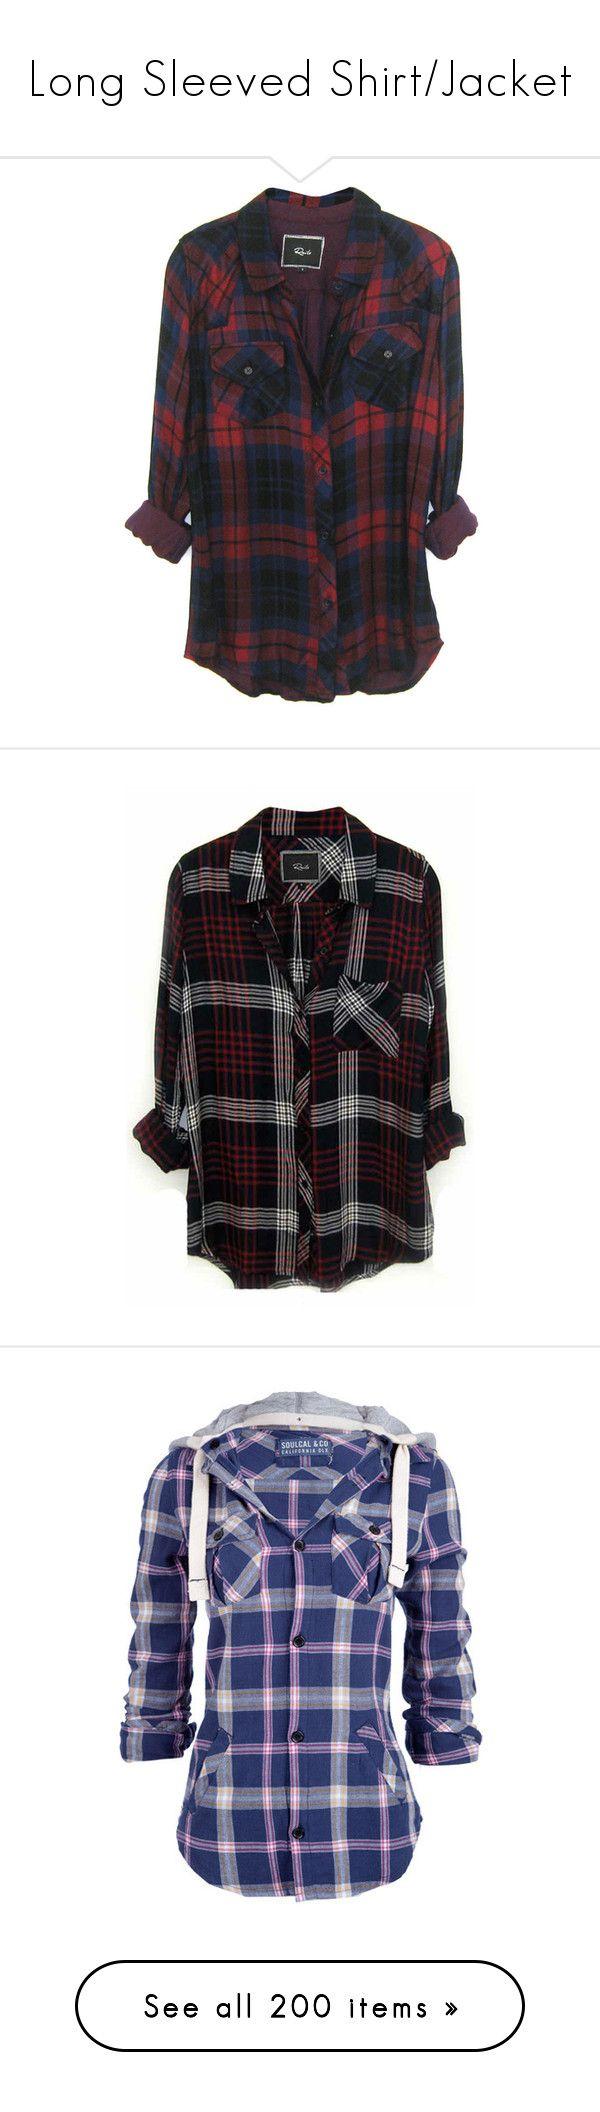 """Long Sleeved Shirt/Jacket"" by blaizeg ❤ liked on Polyvore featuring tops, shirts, flannels, jackets, plaid top, tencel shirt, tartan top, plaid shirts, tartan shirts and flannel top"